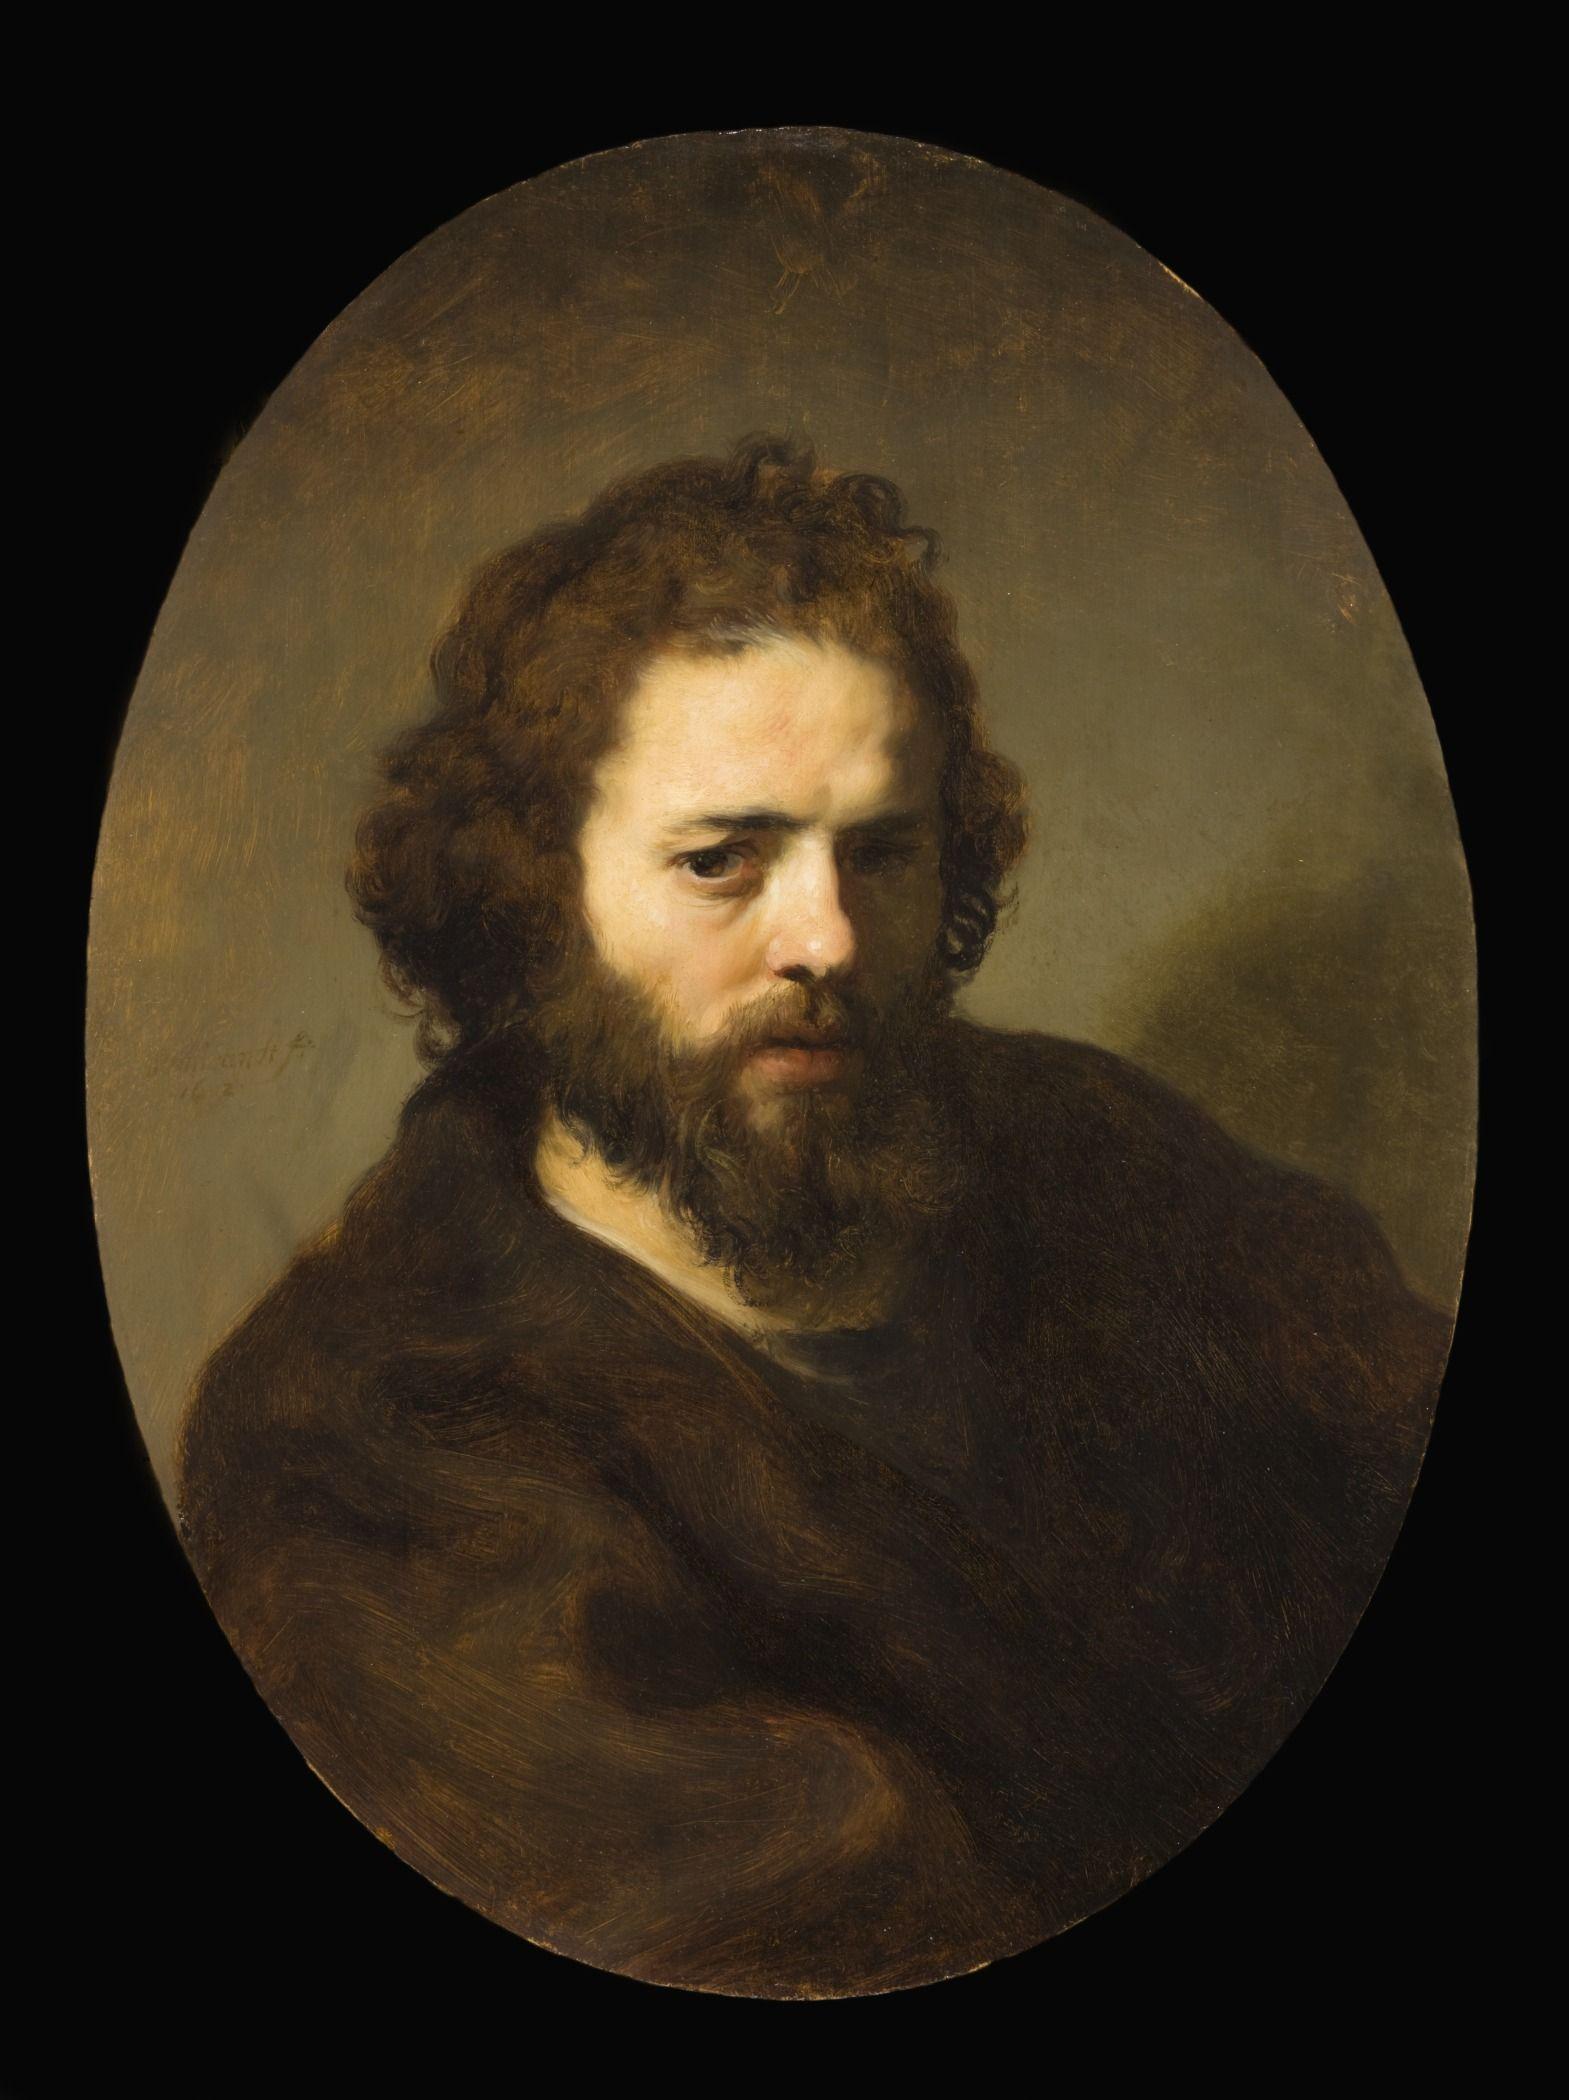 Portrait of a Bearded Man | Govaert Flinck | Oil Painting